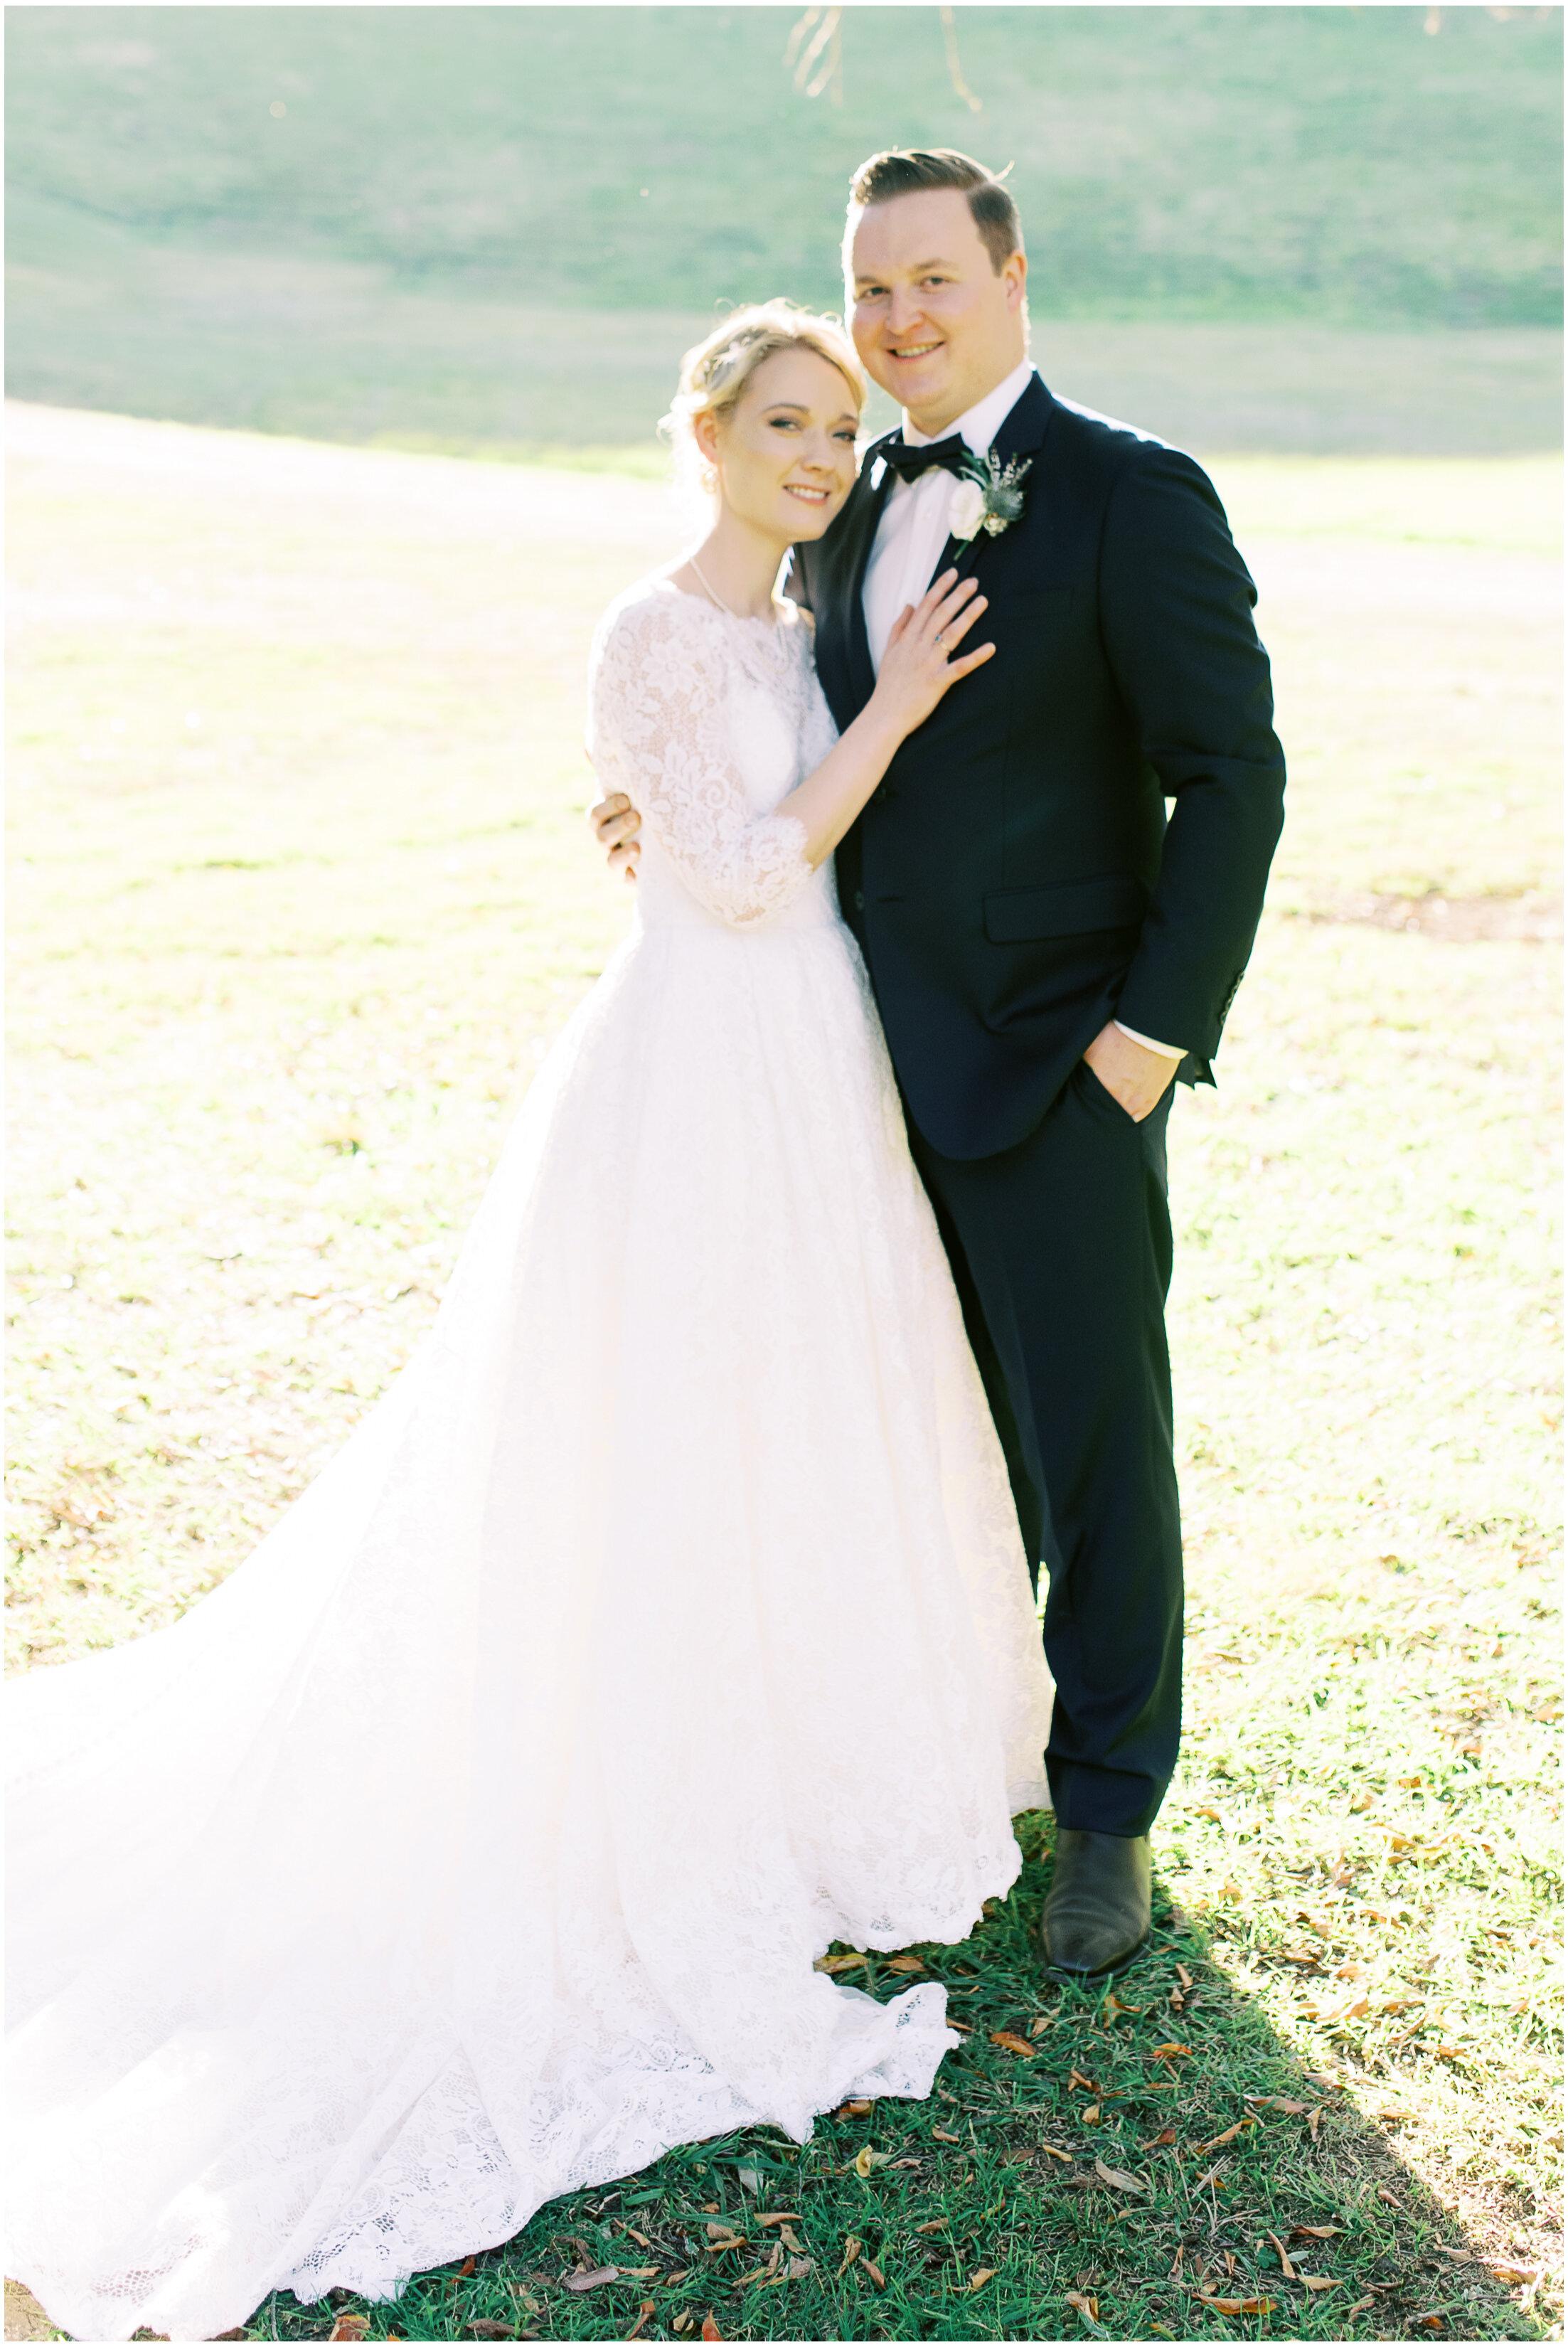 brisbane-fine-art-wedding-photographer-lauren-olivia-luxury-wedding-australia-20.jpg